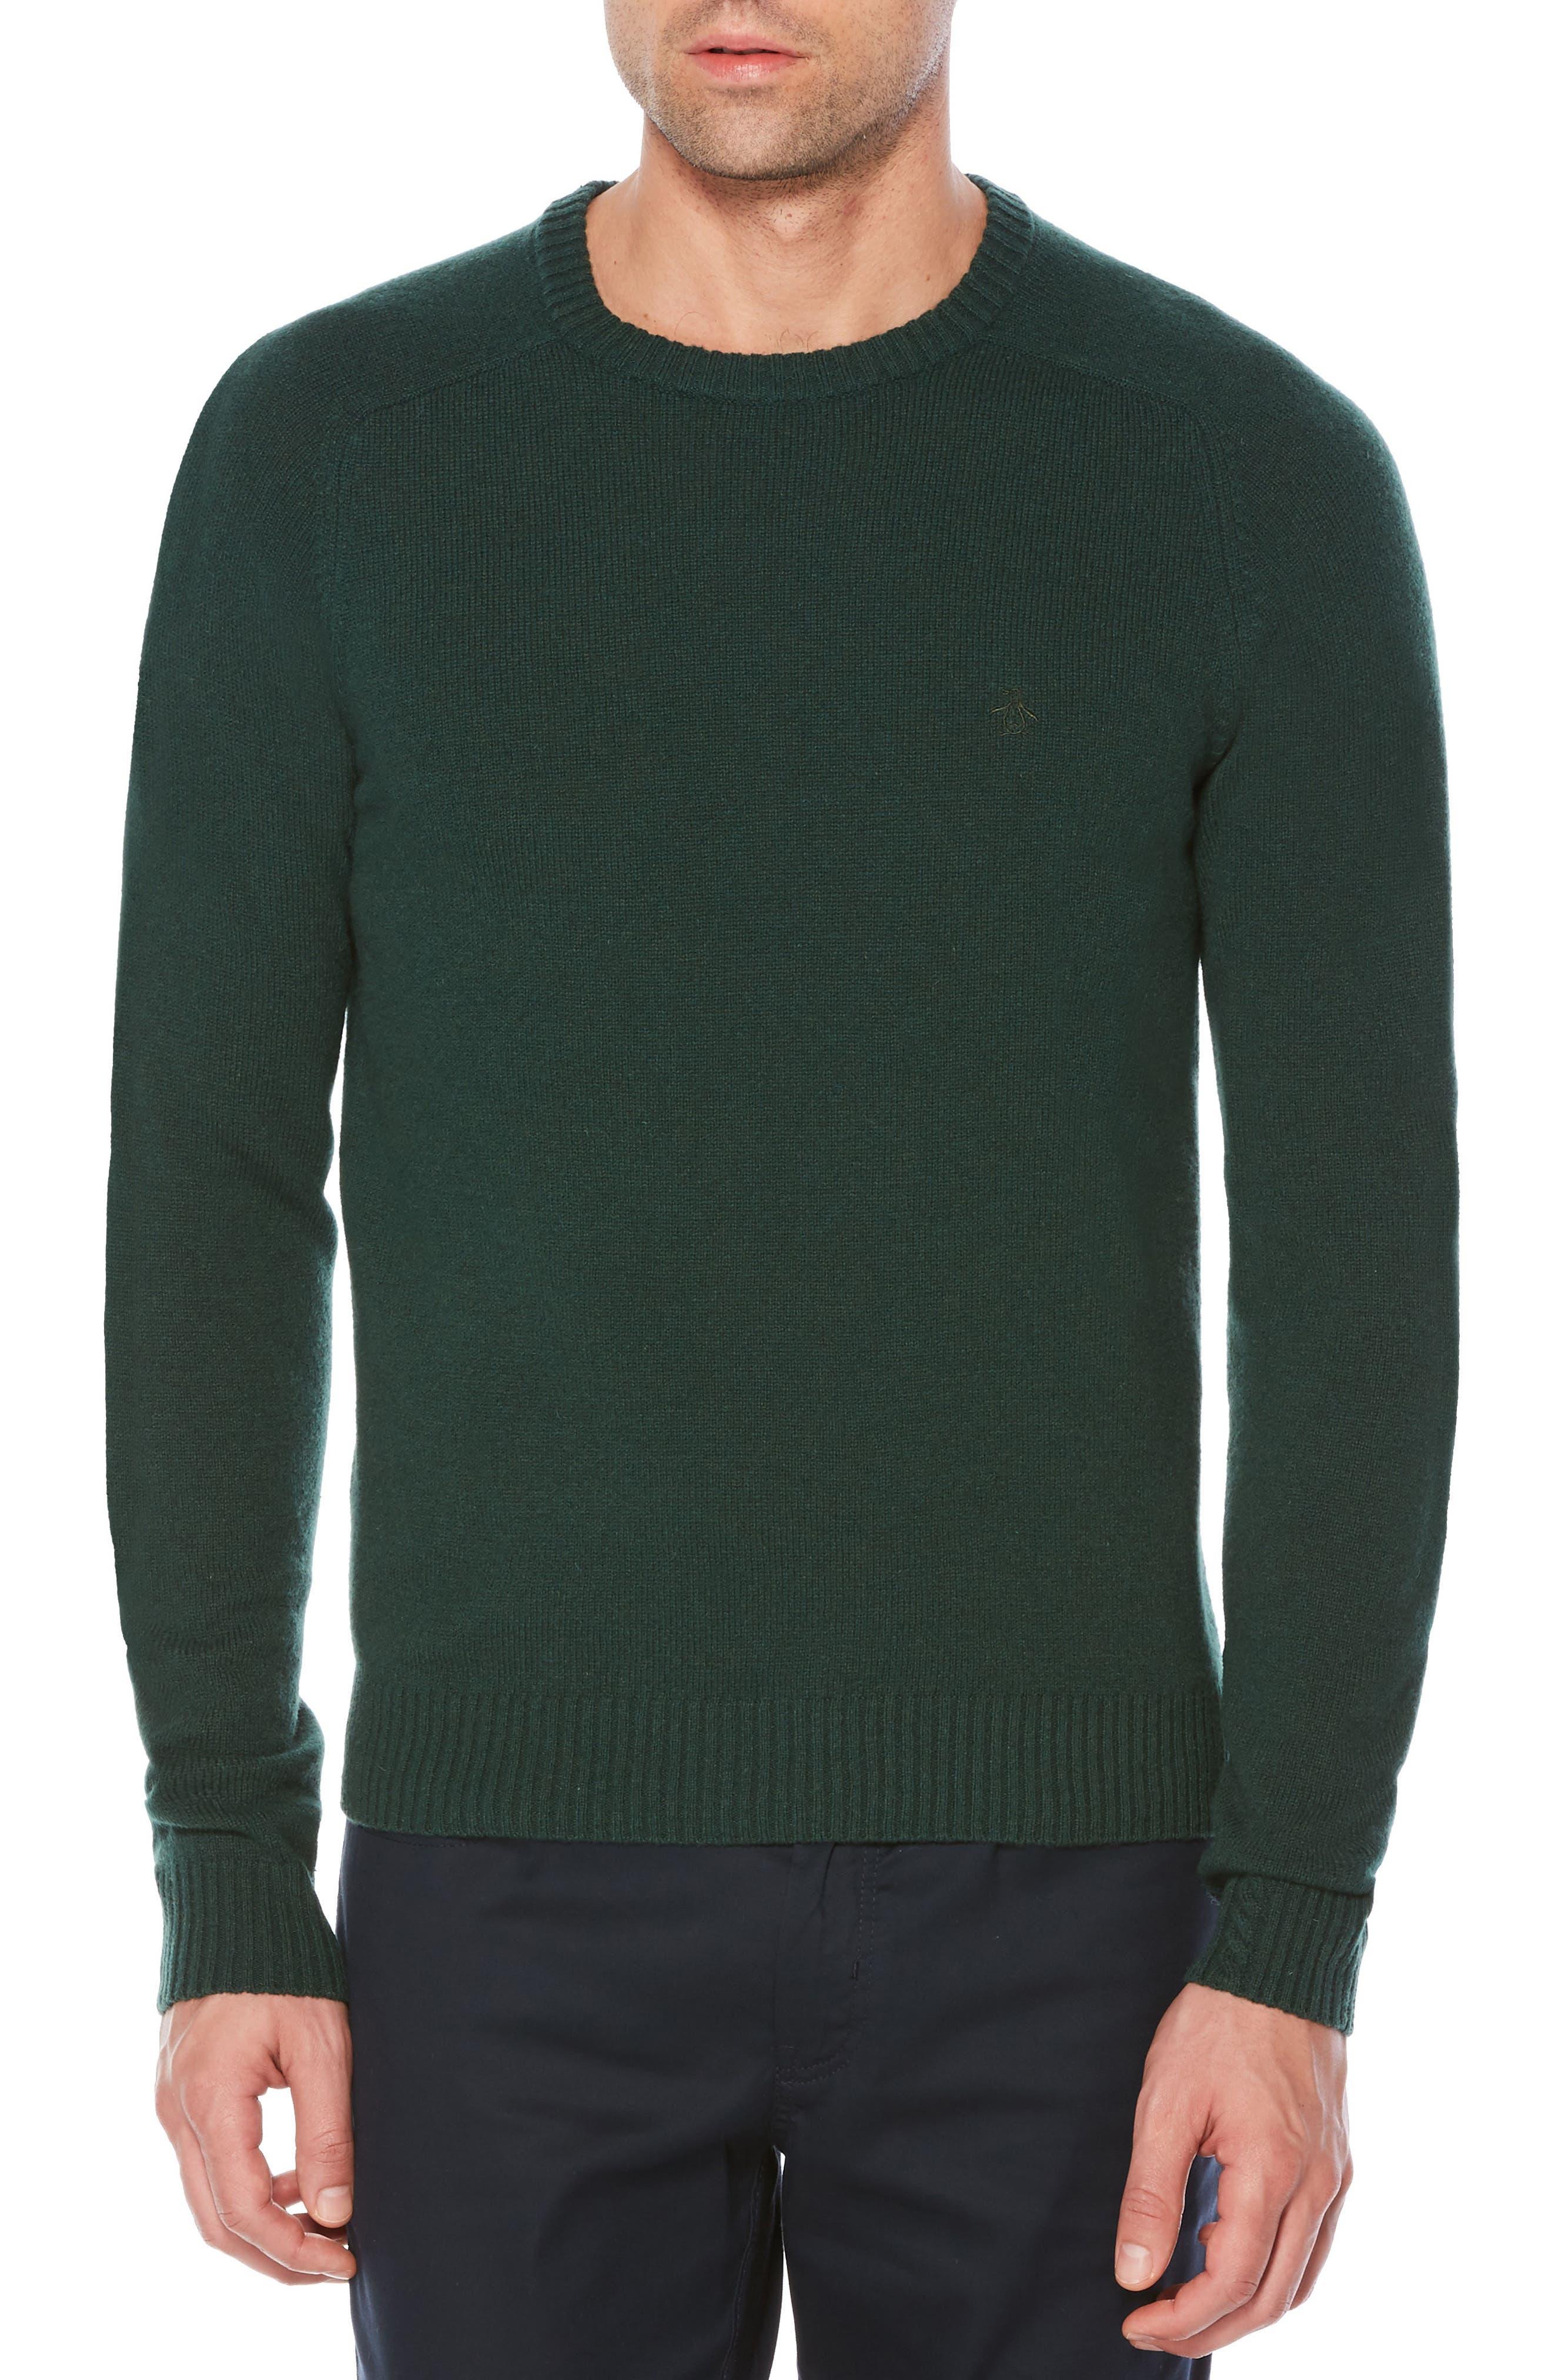 P55 Lambswool Sweater,                             Main thumbnail 2, color,